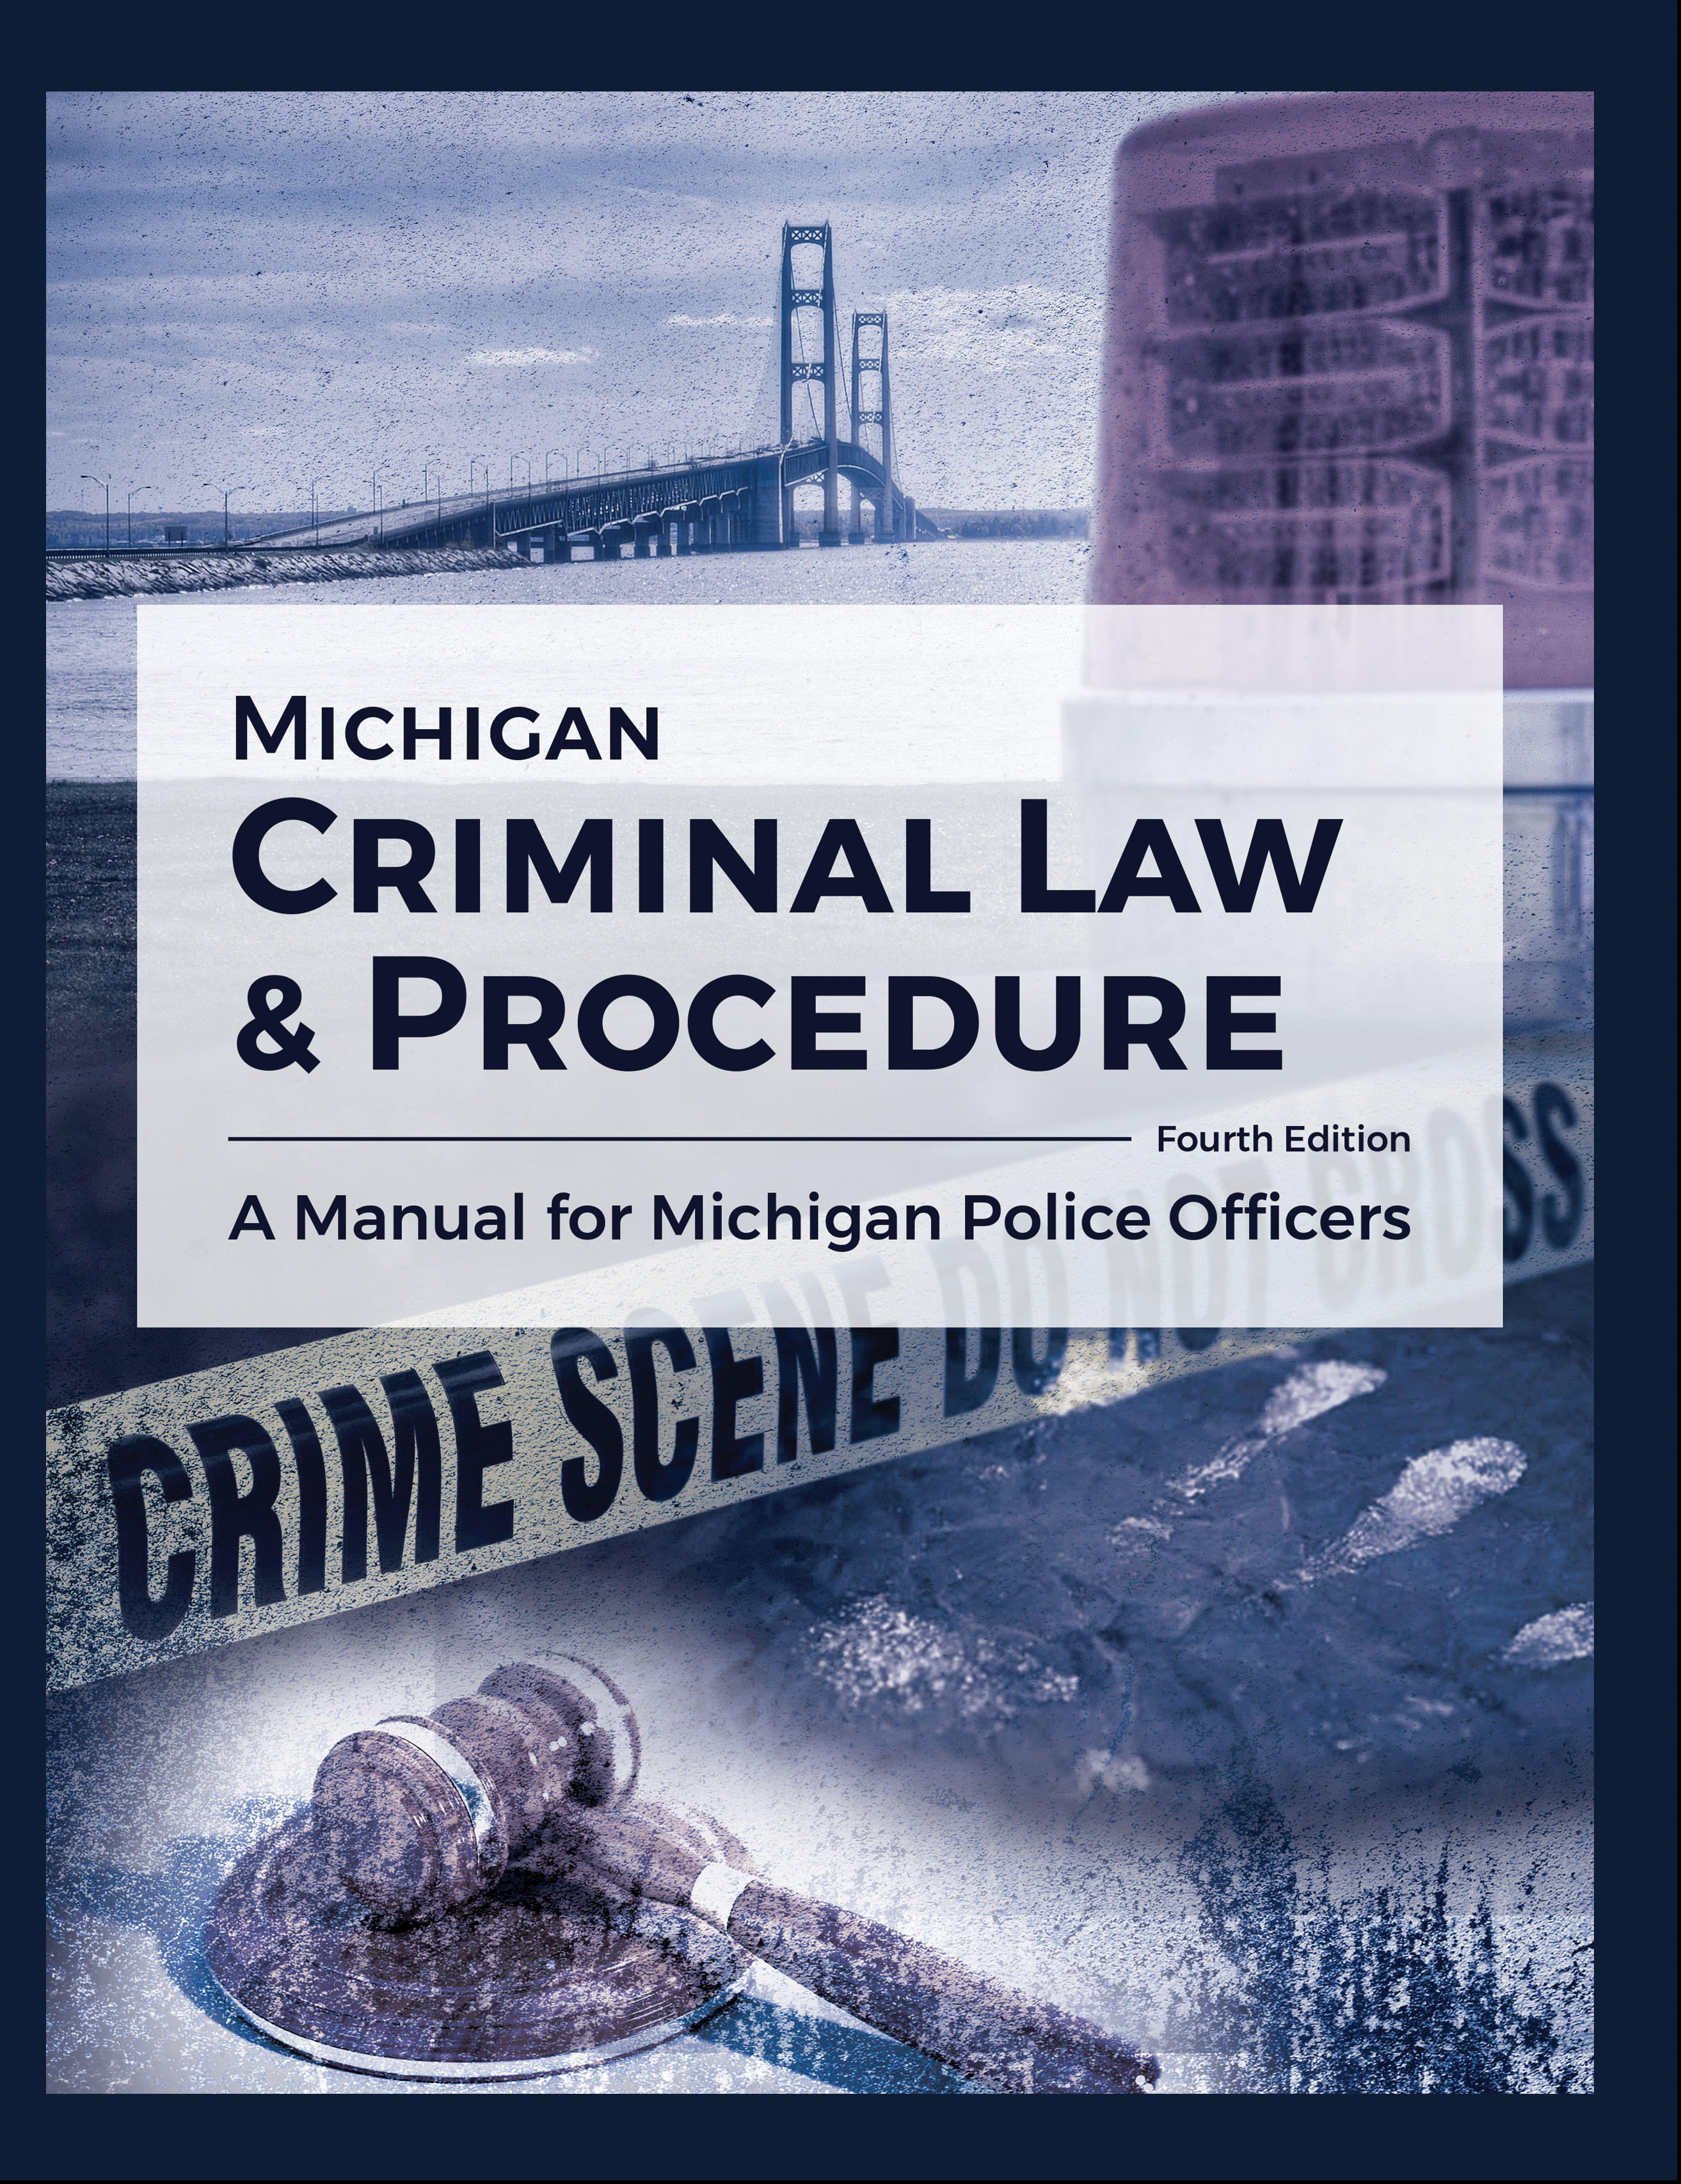 Michigan Criminal Law & Procedure: A Manual for Michigan